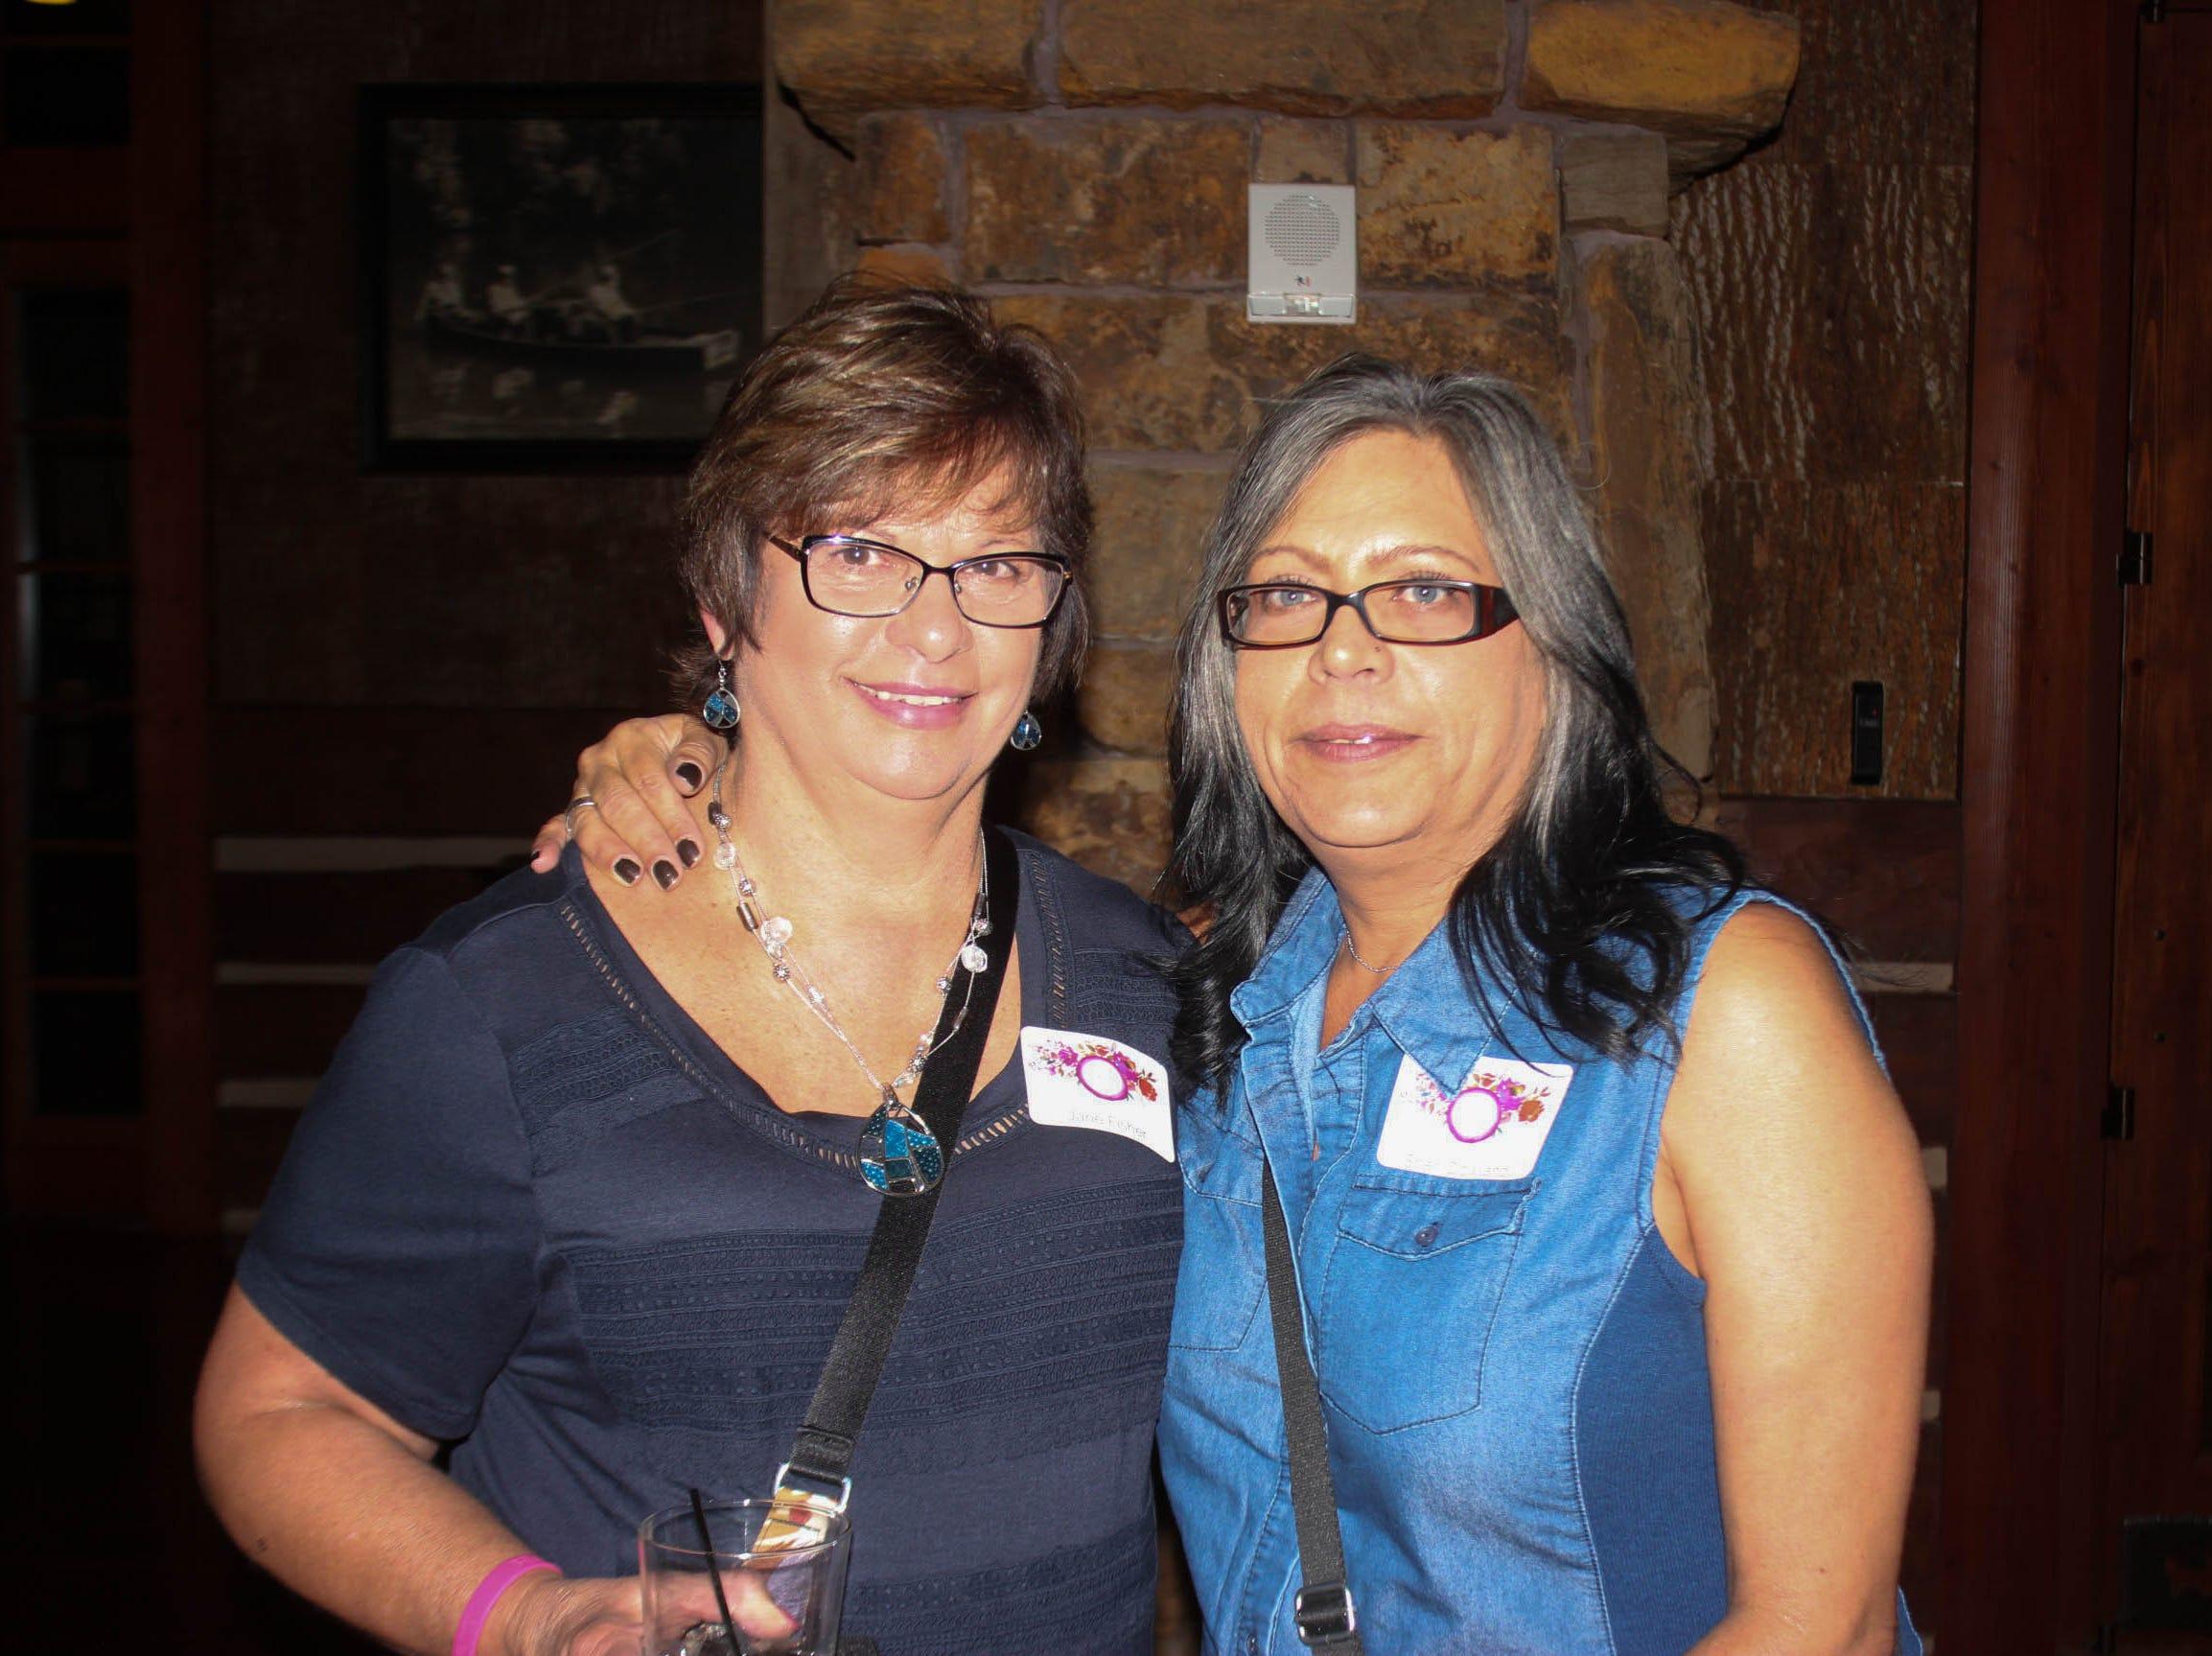 Jane Fisher and Sheri Dowland